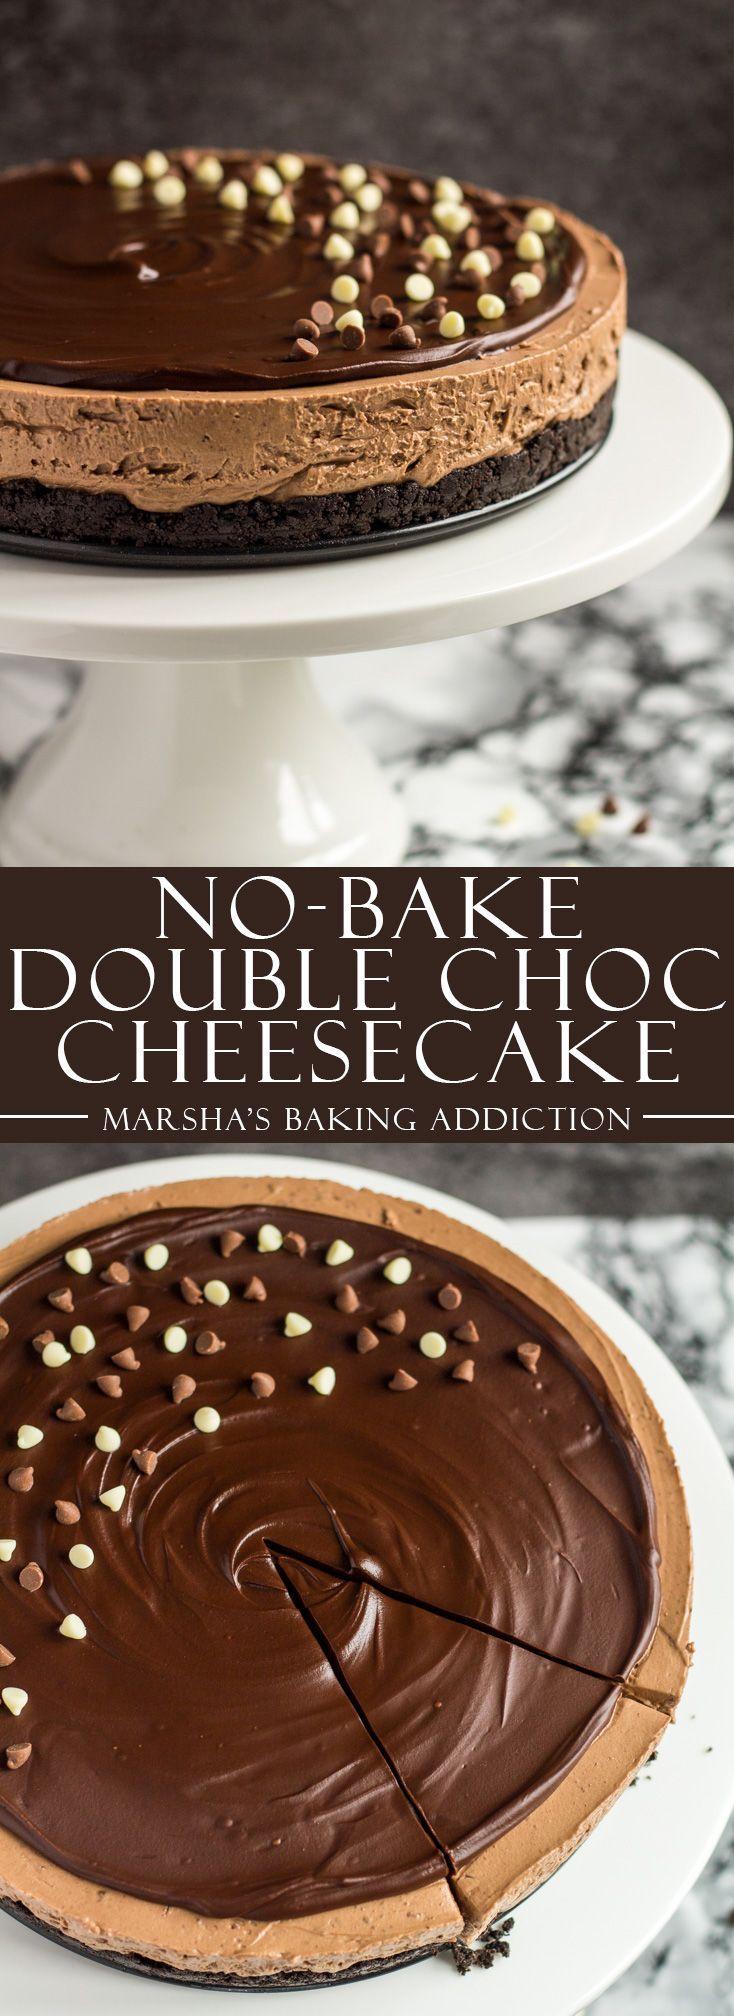 No-Bake Double Chocolate Cheesecake | marshasbakingaddiction.com @marshasbakeblog